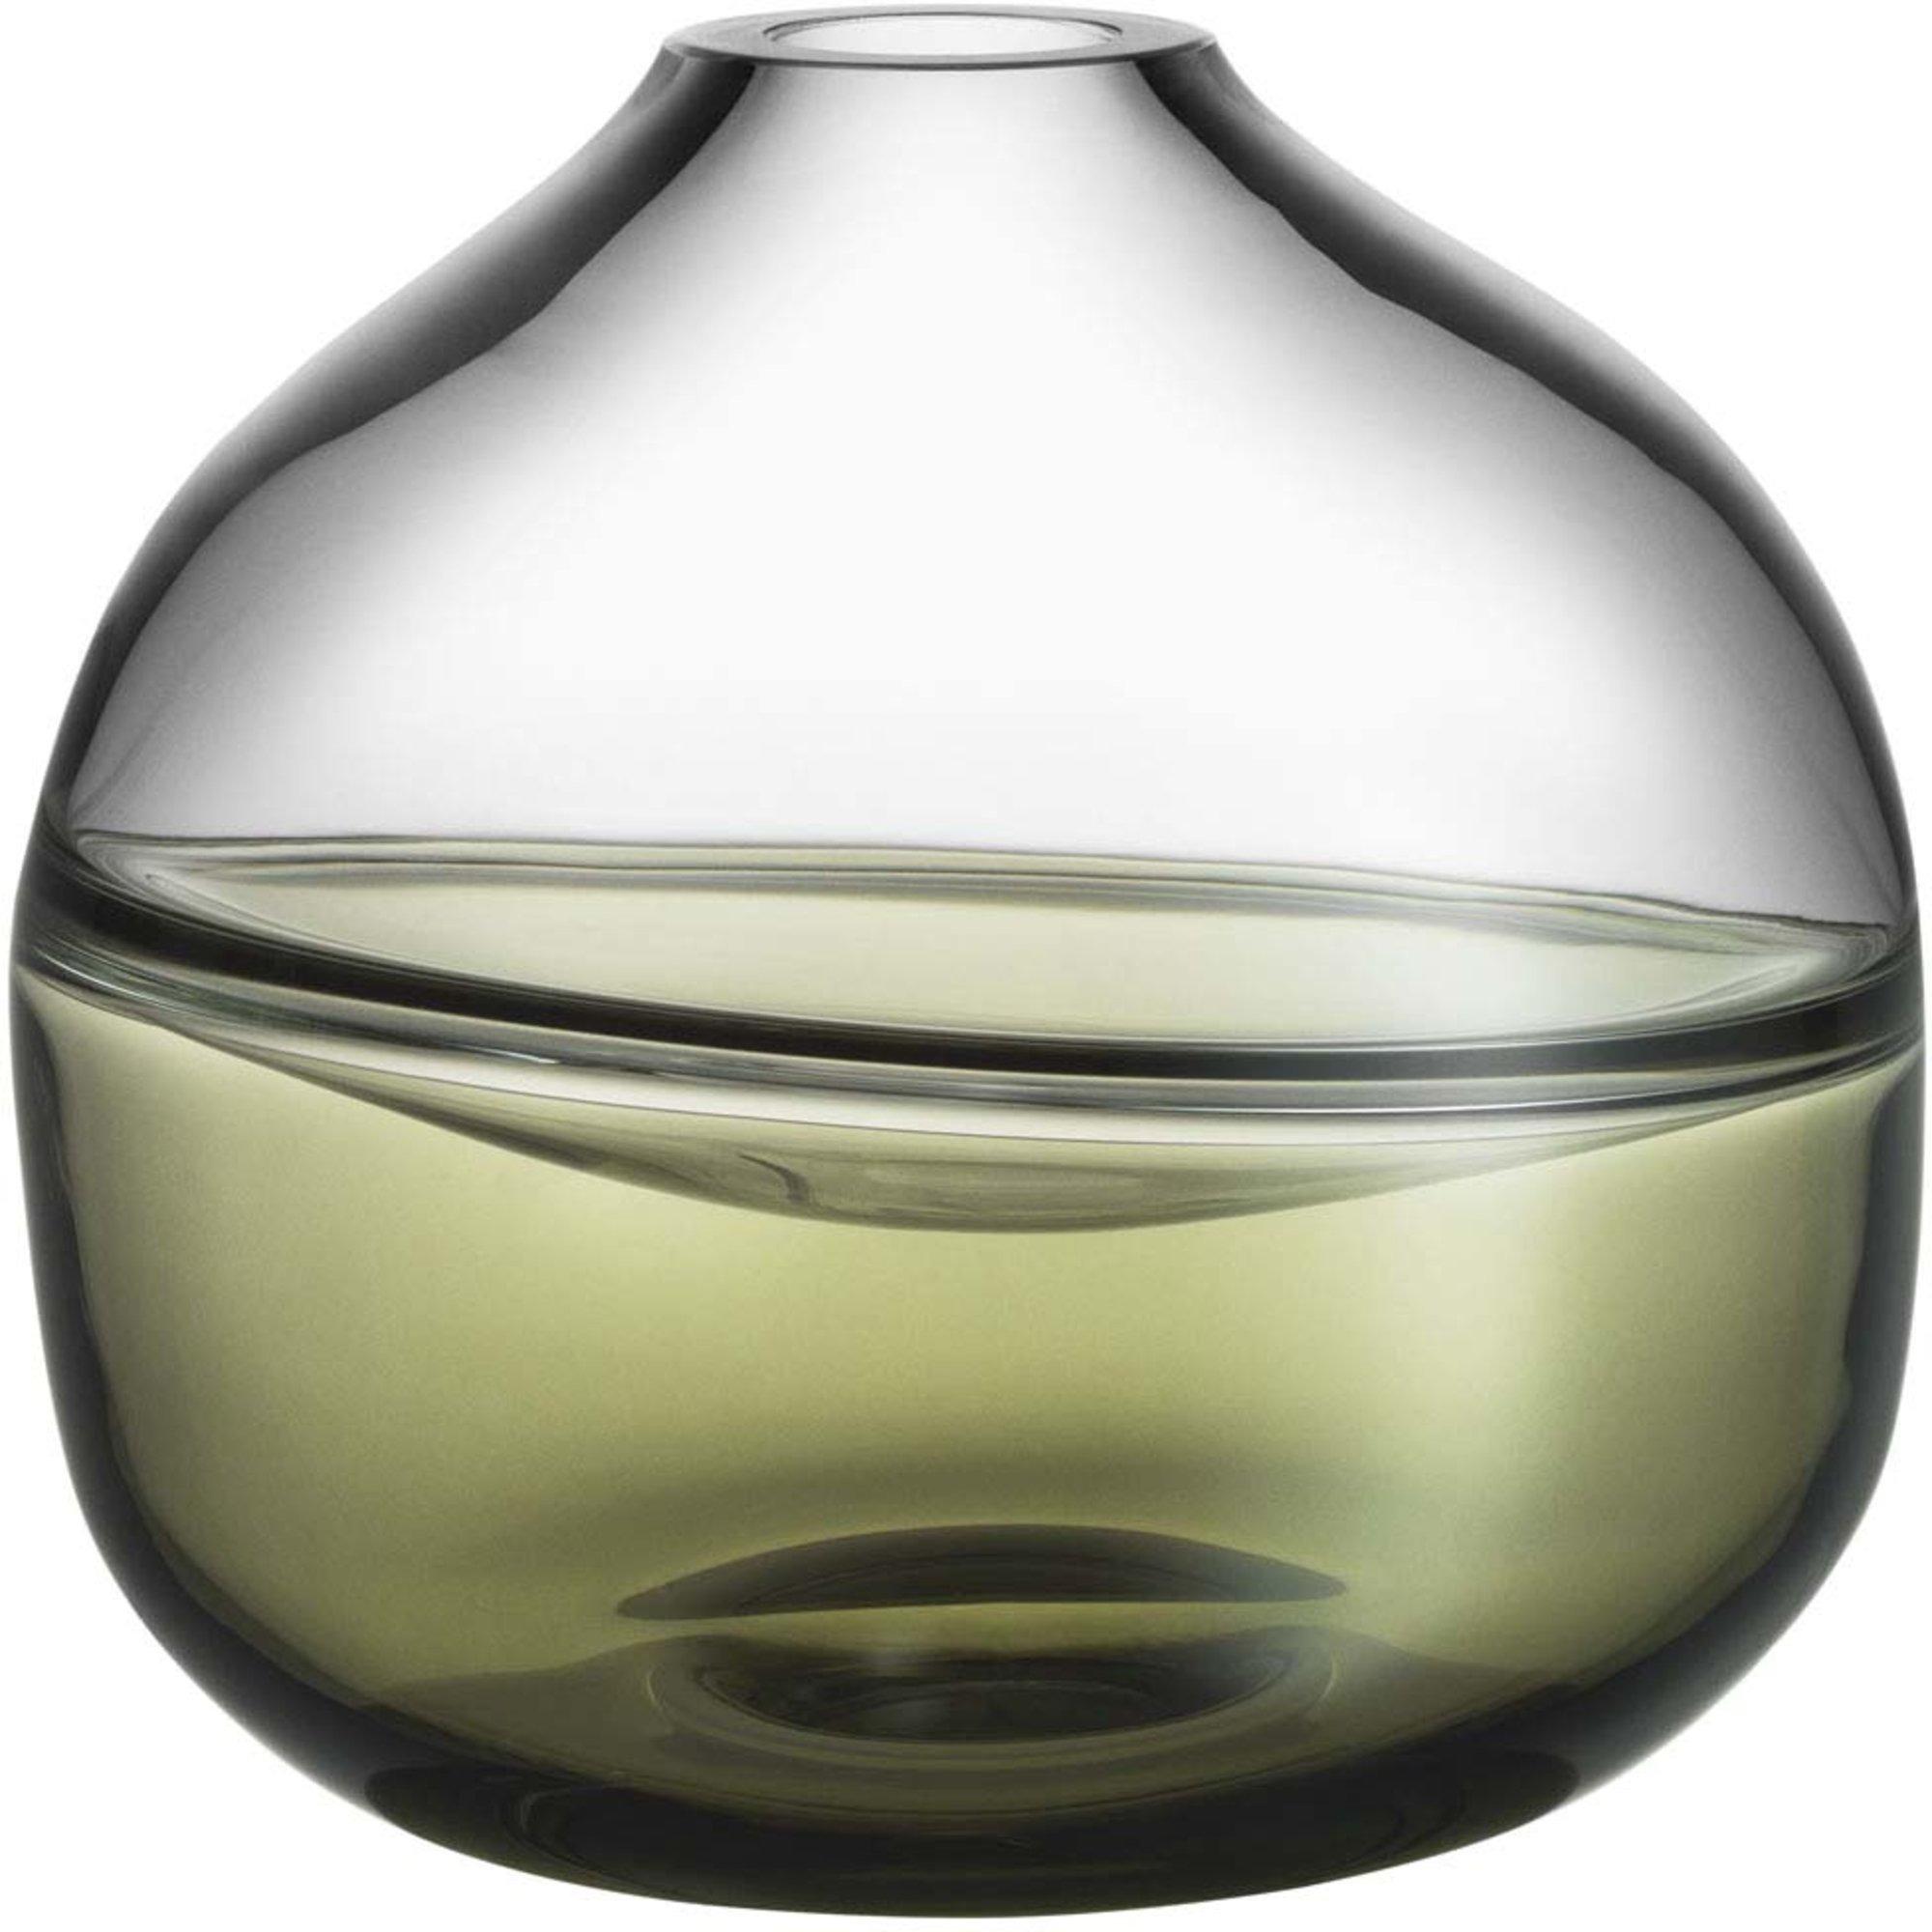 Kosta Boda Septum Mossgrön Vas Limited Edition